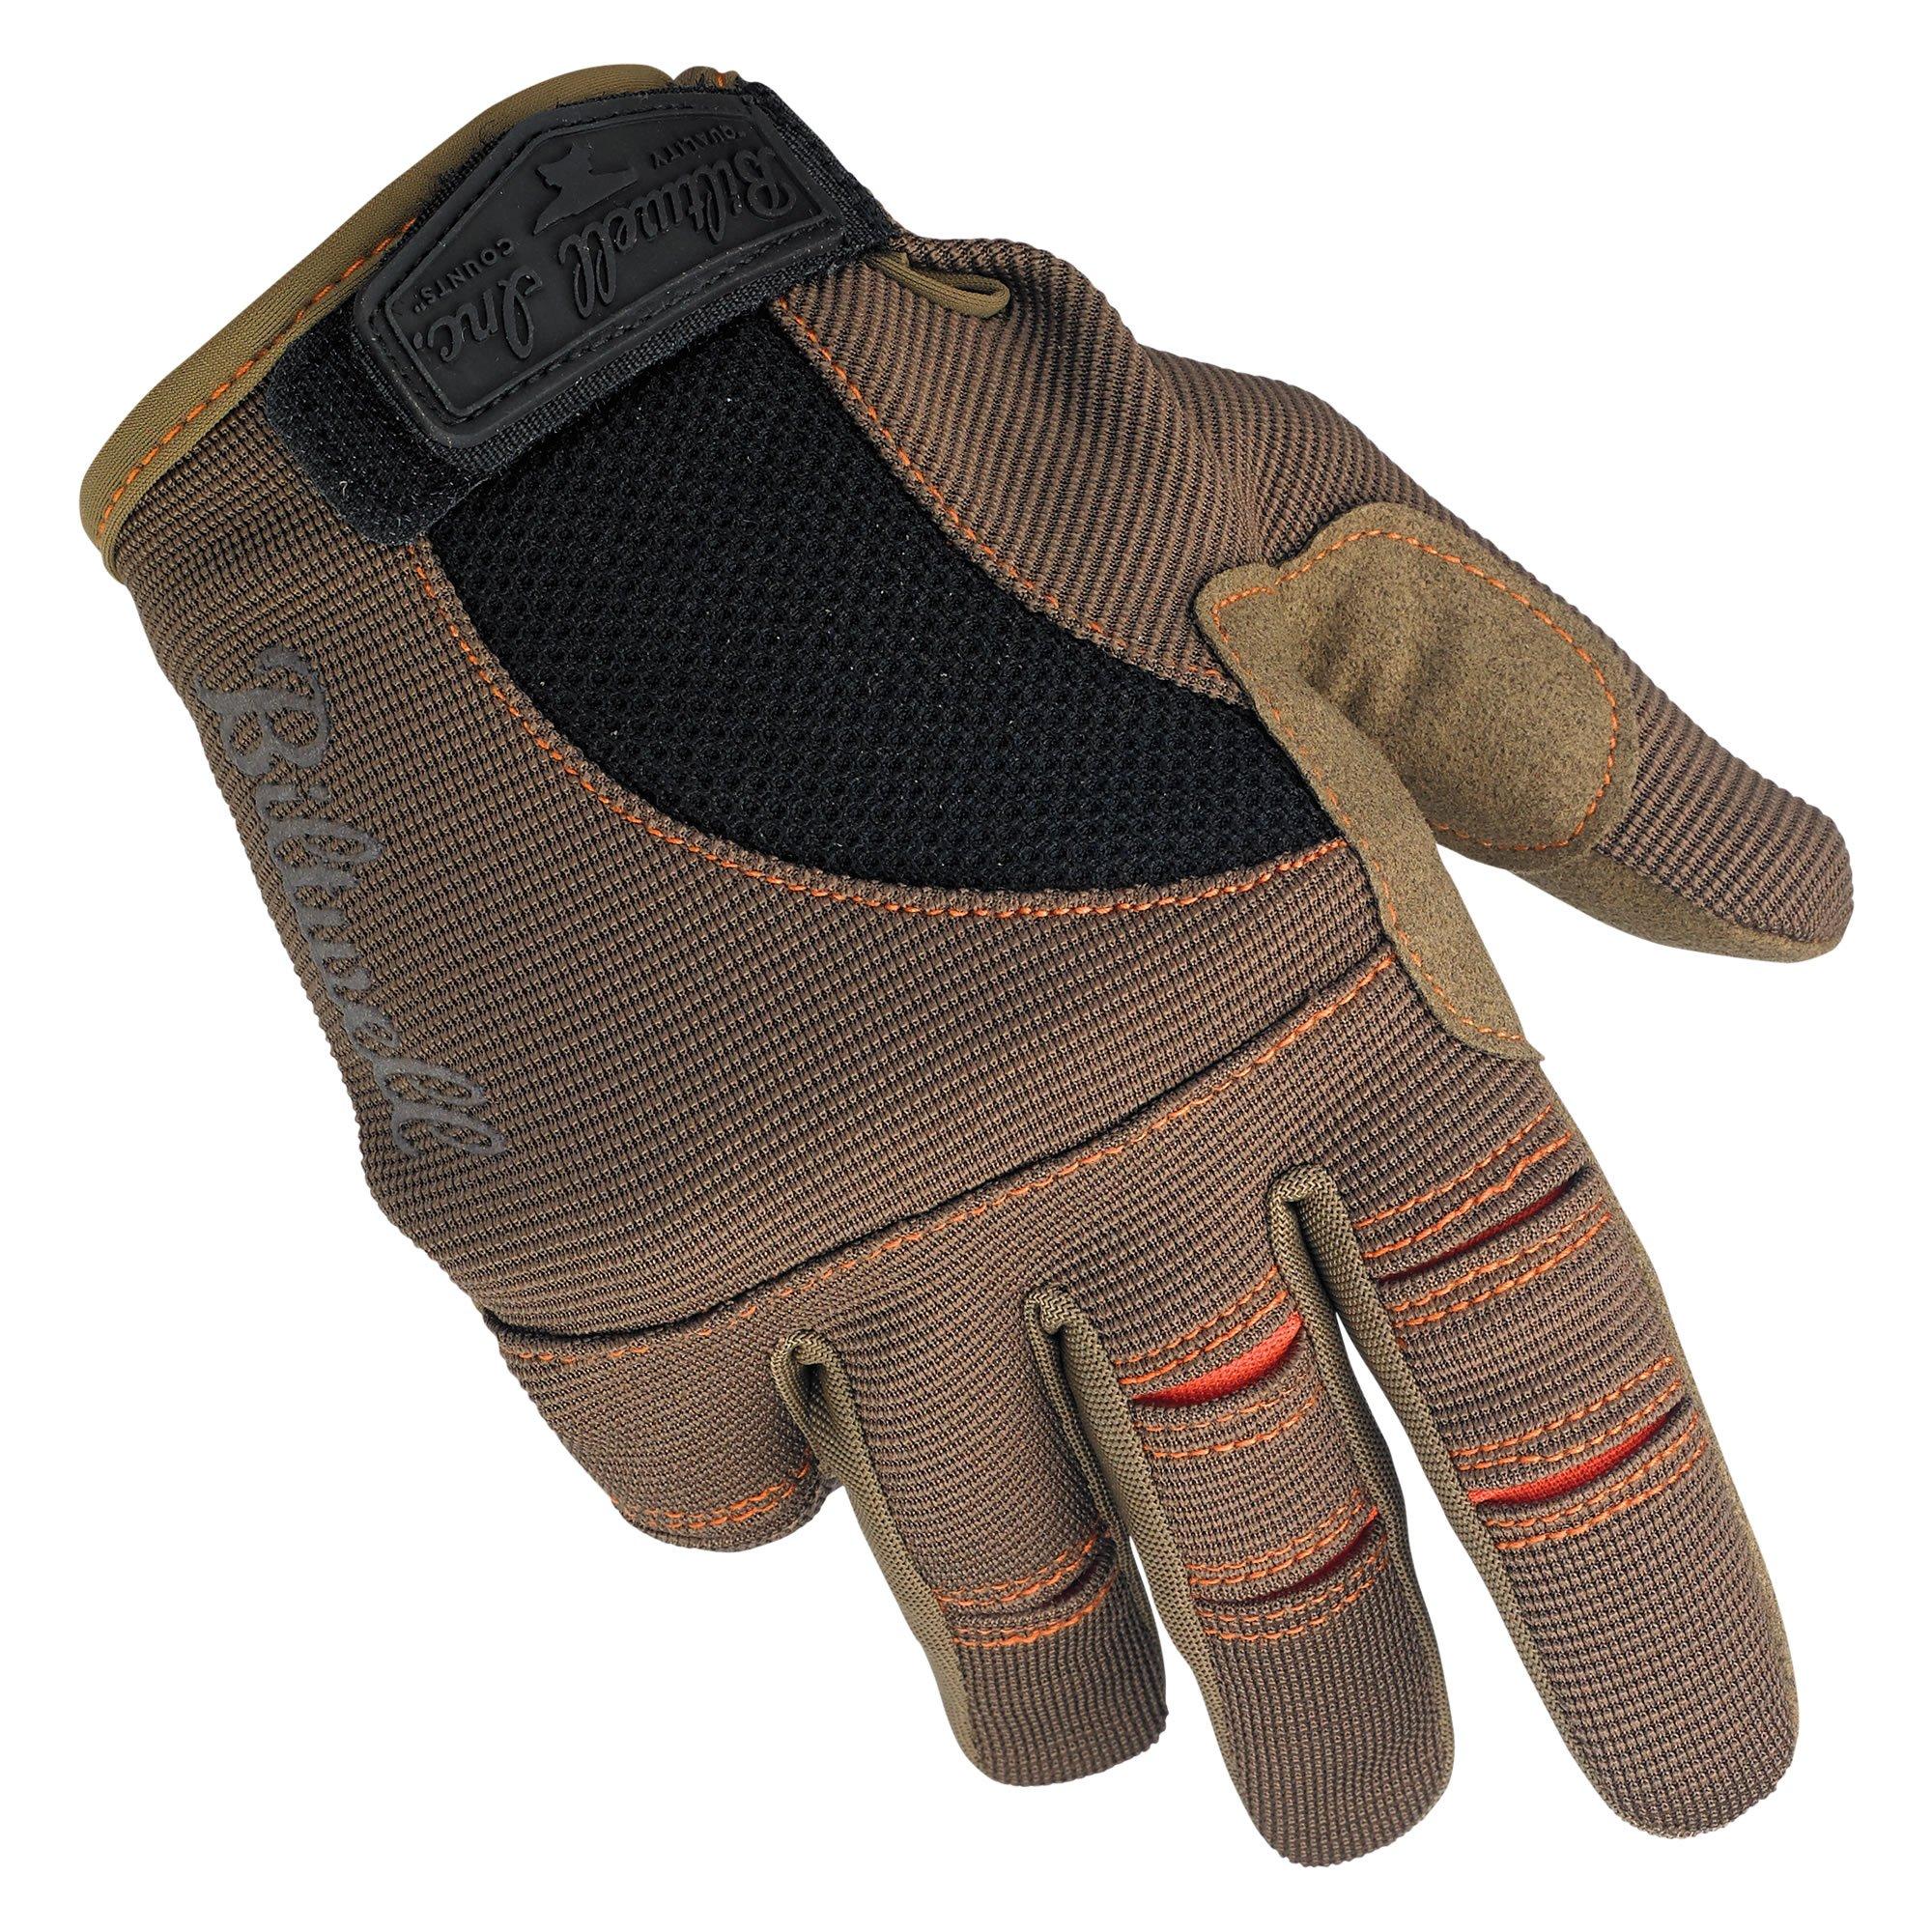 Biltwell Moto Gloves (Brown/Orange, Large)